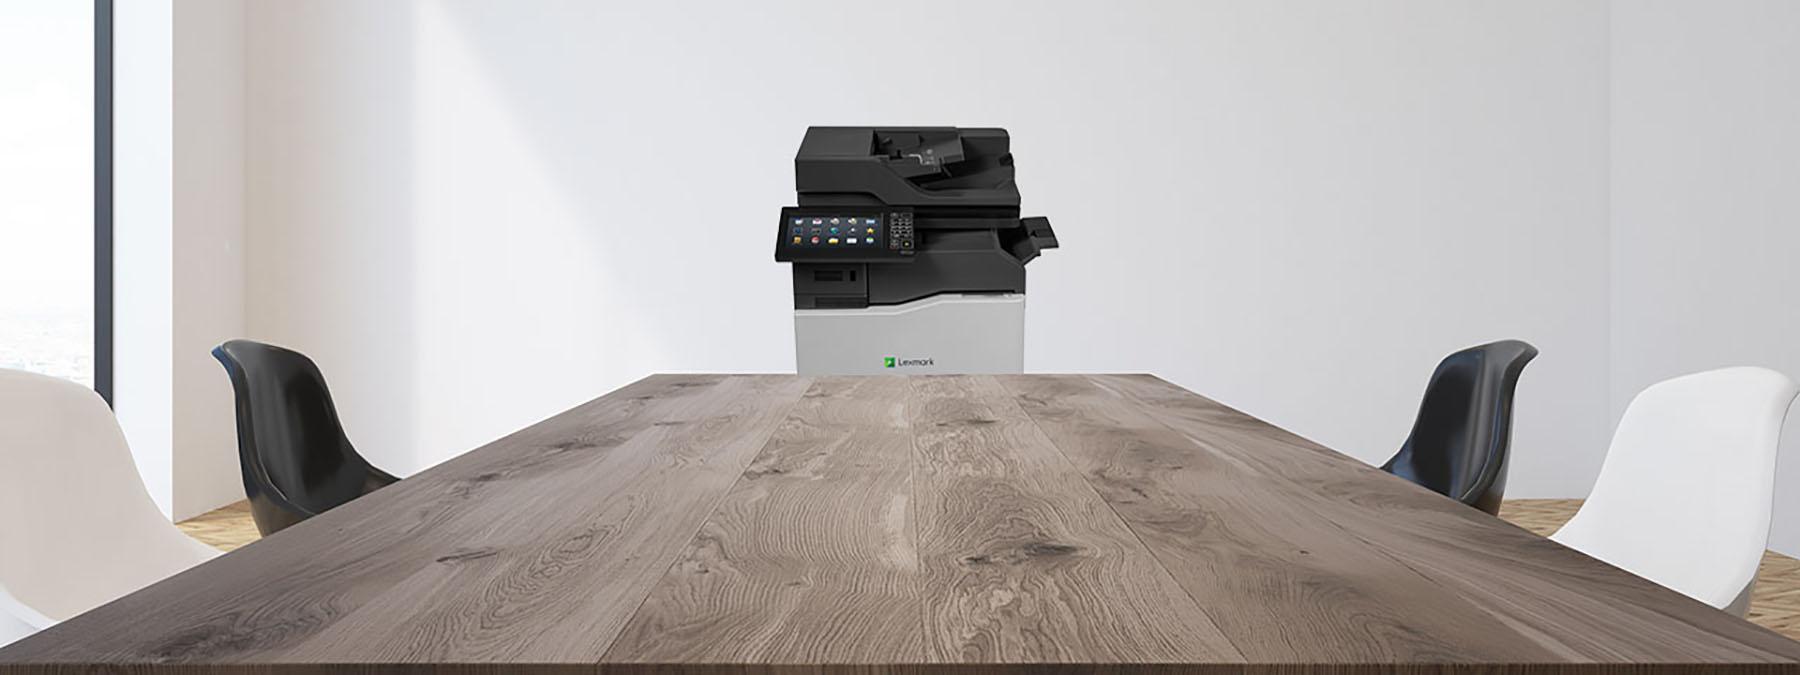 Lexmark Printer in office space